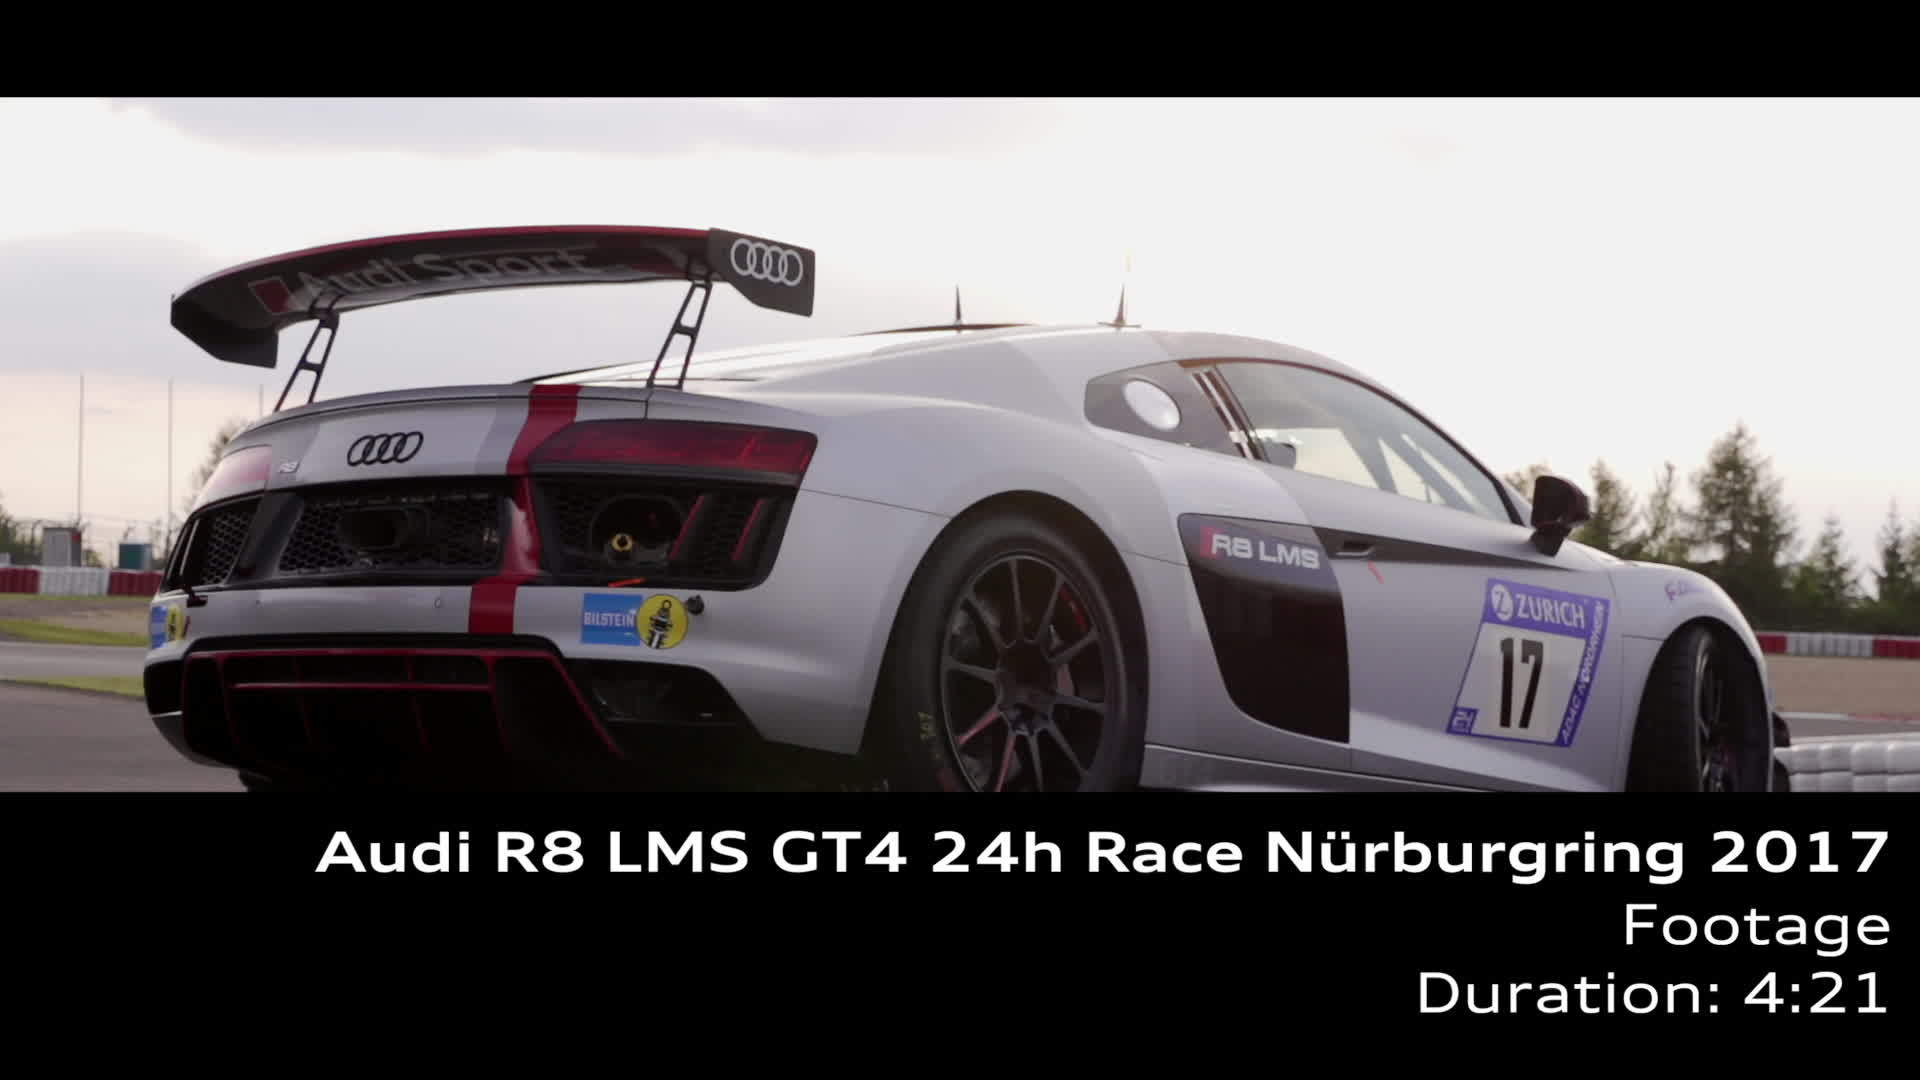 Audi R8 LMS GT4 - Footage